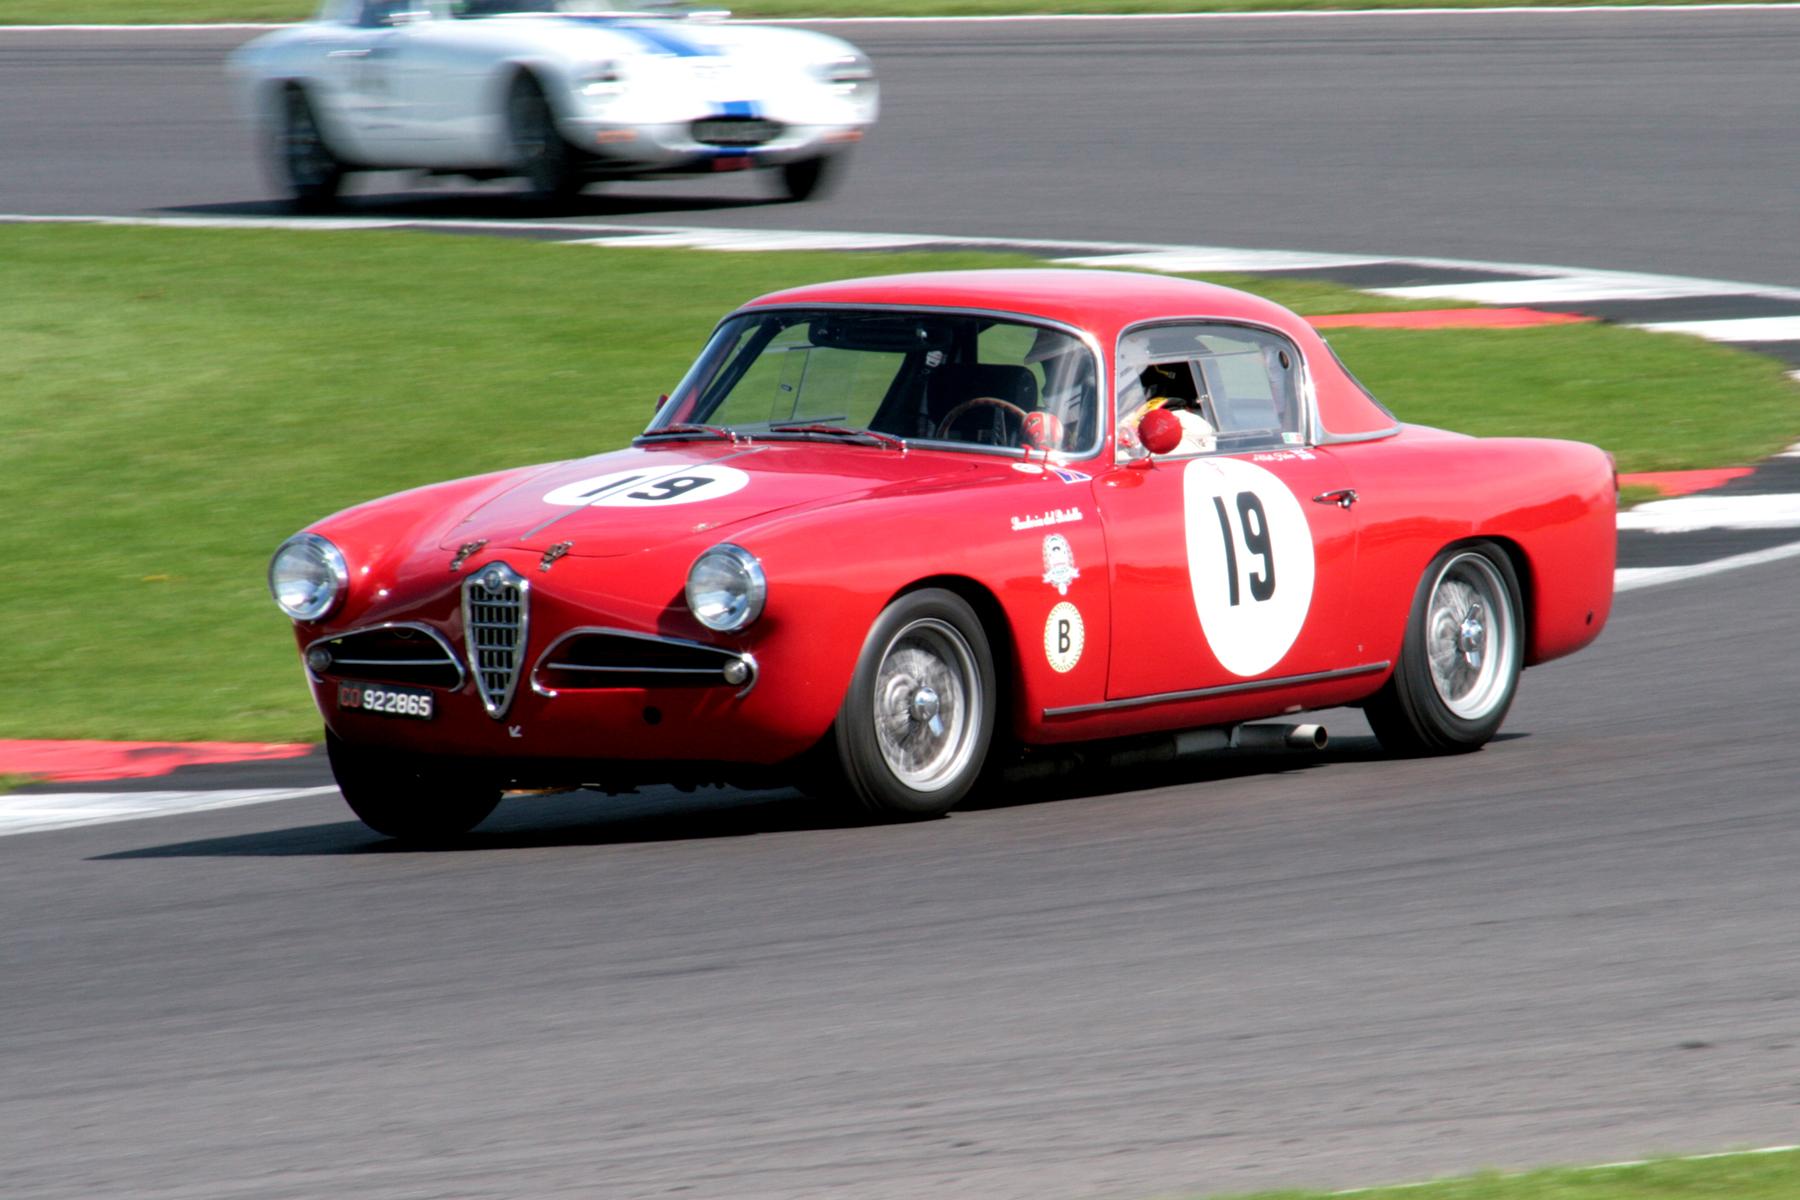 Matthew Holme in the stunning Alfa, presses on                                Photo - John Turner